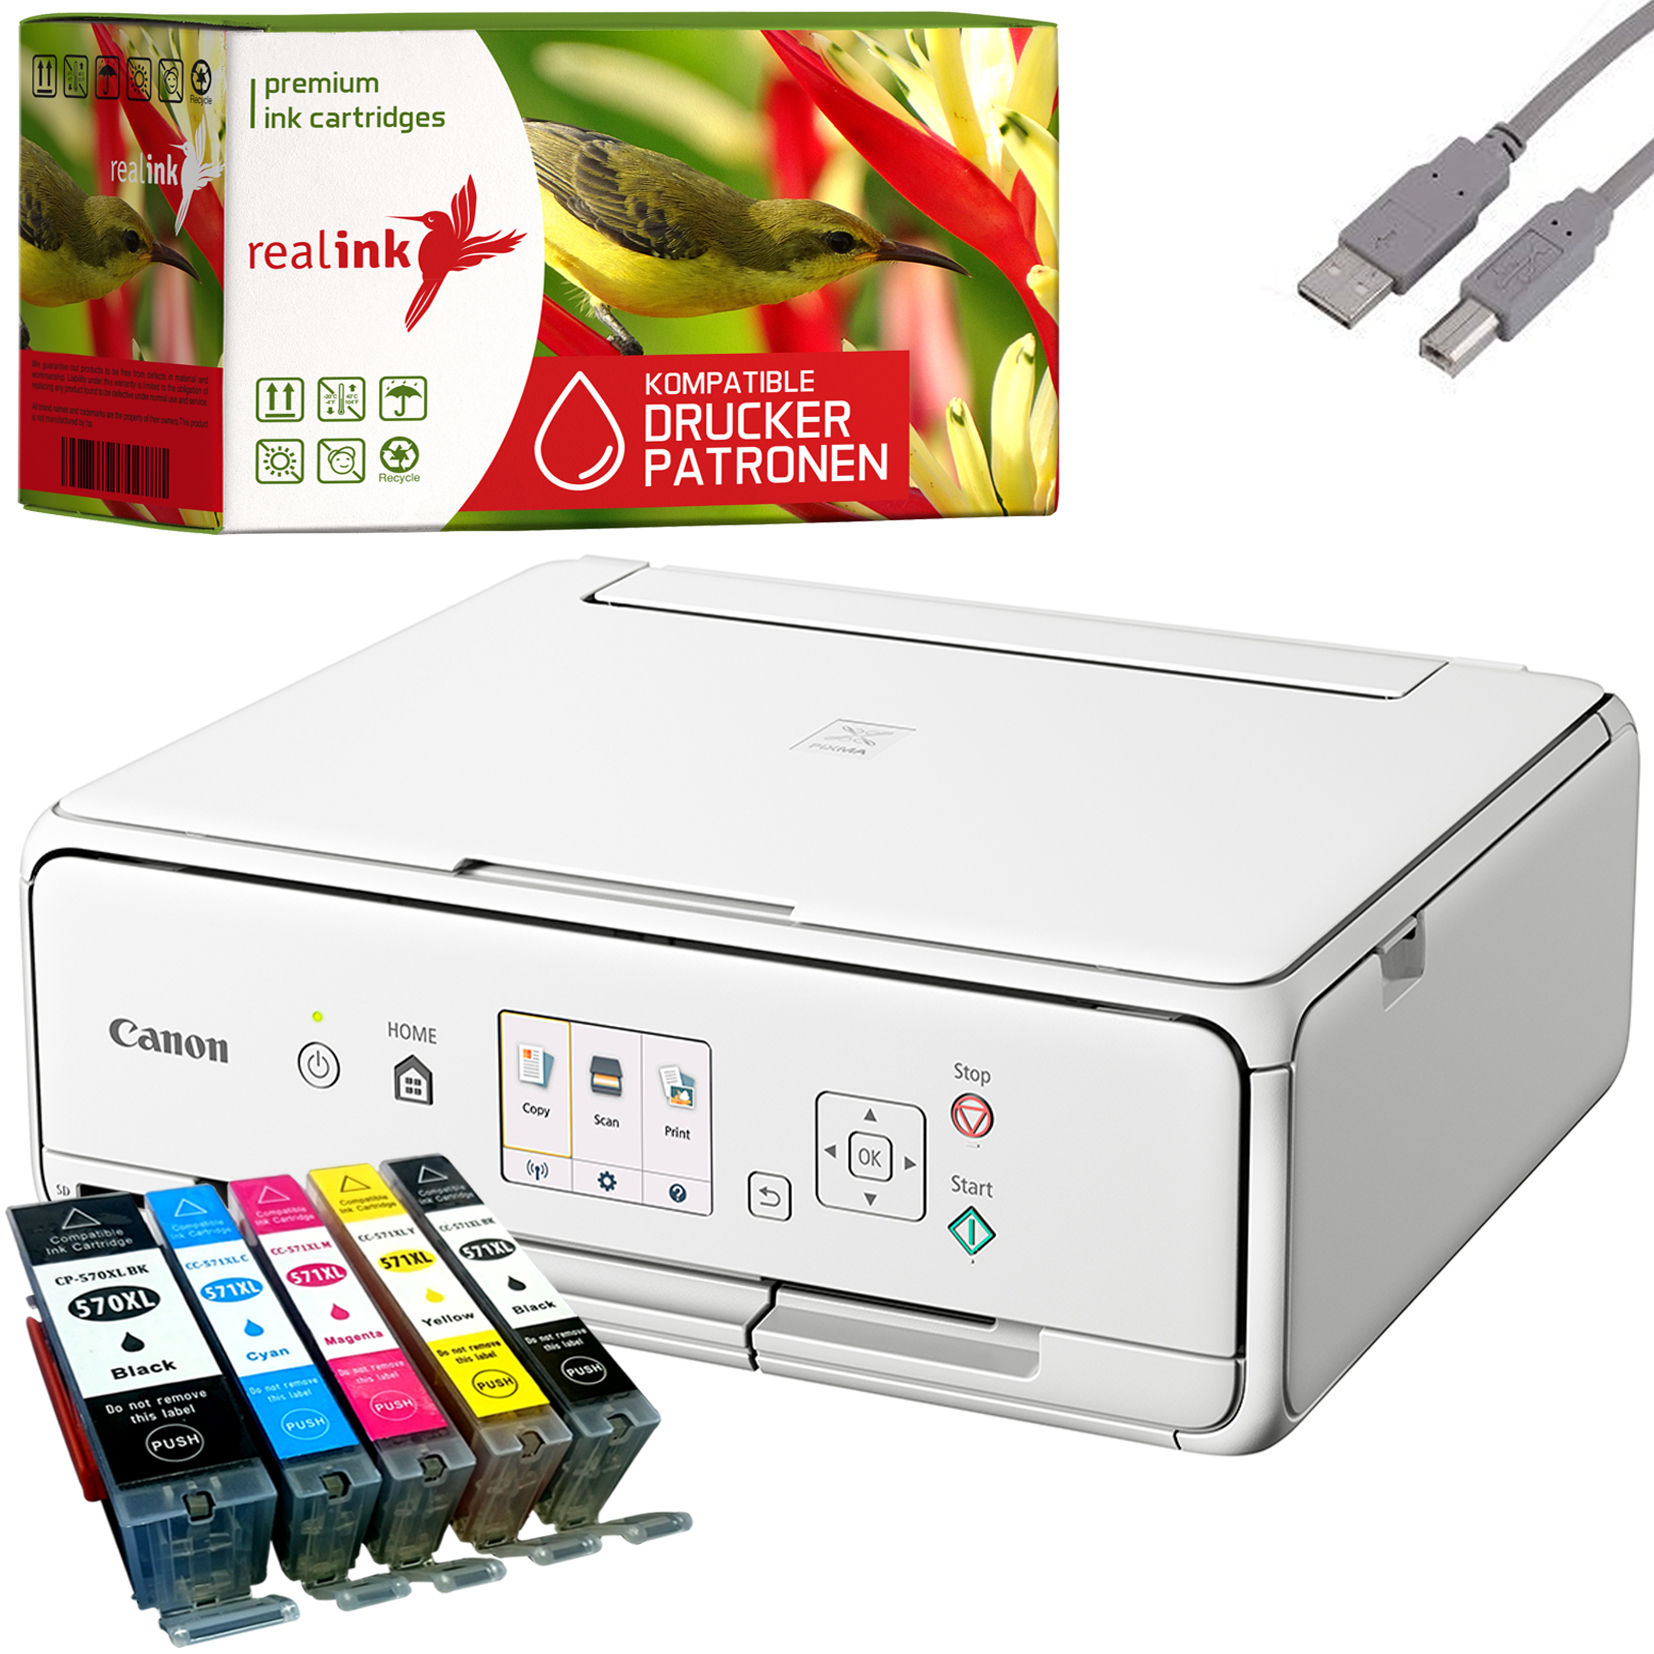 Canon-PIXMA-TS5051-Multifunktionsgeraet-Drucker-Scanner-Kopierer-weiss-5-Tinten